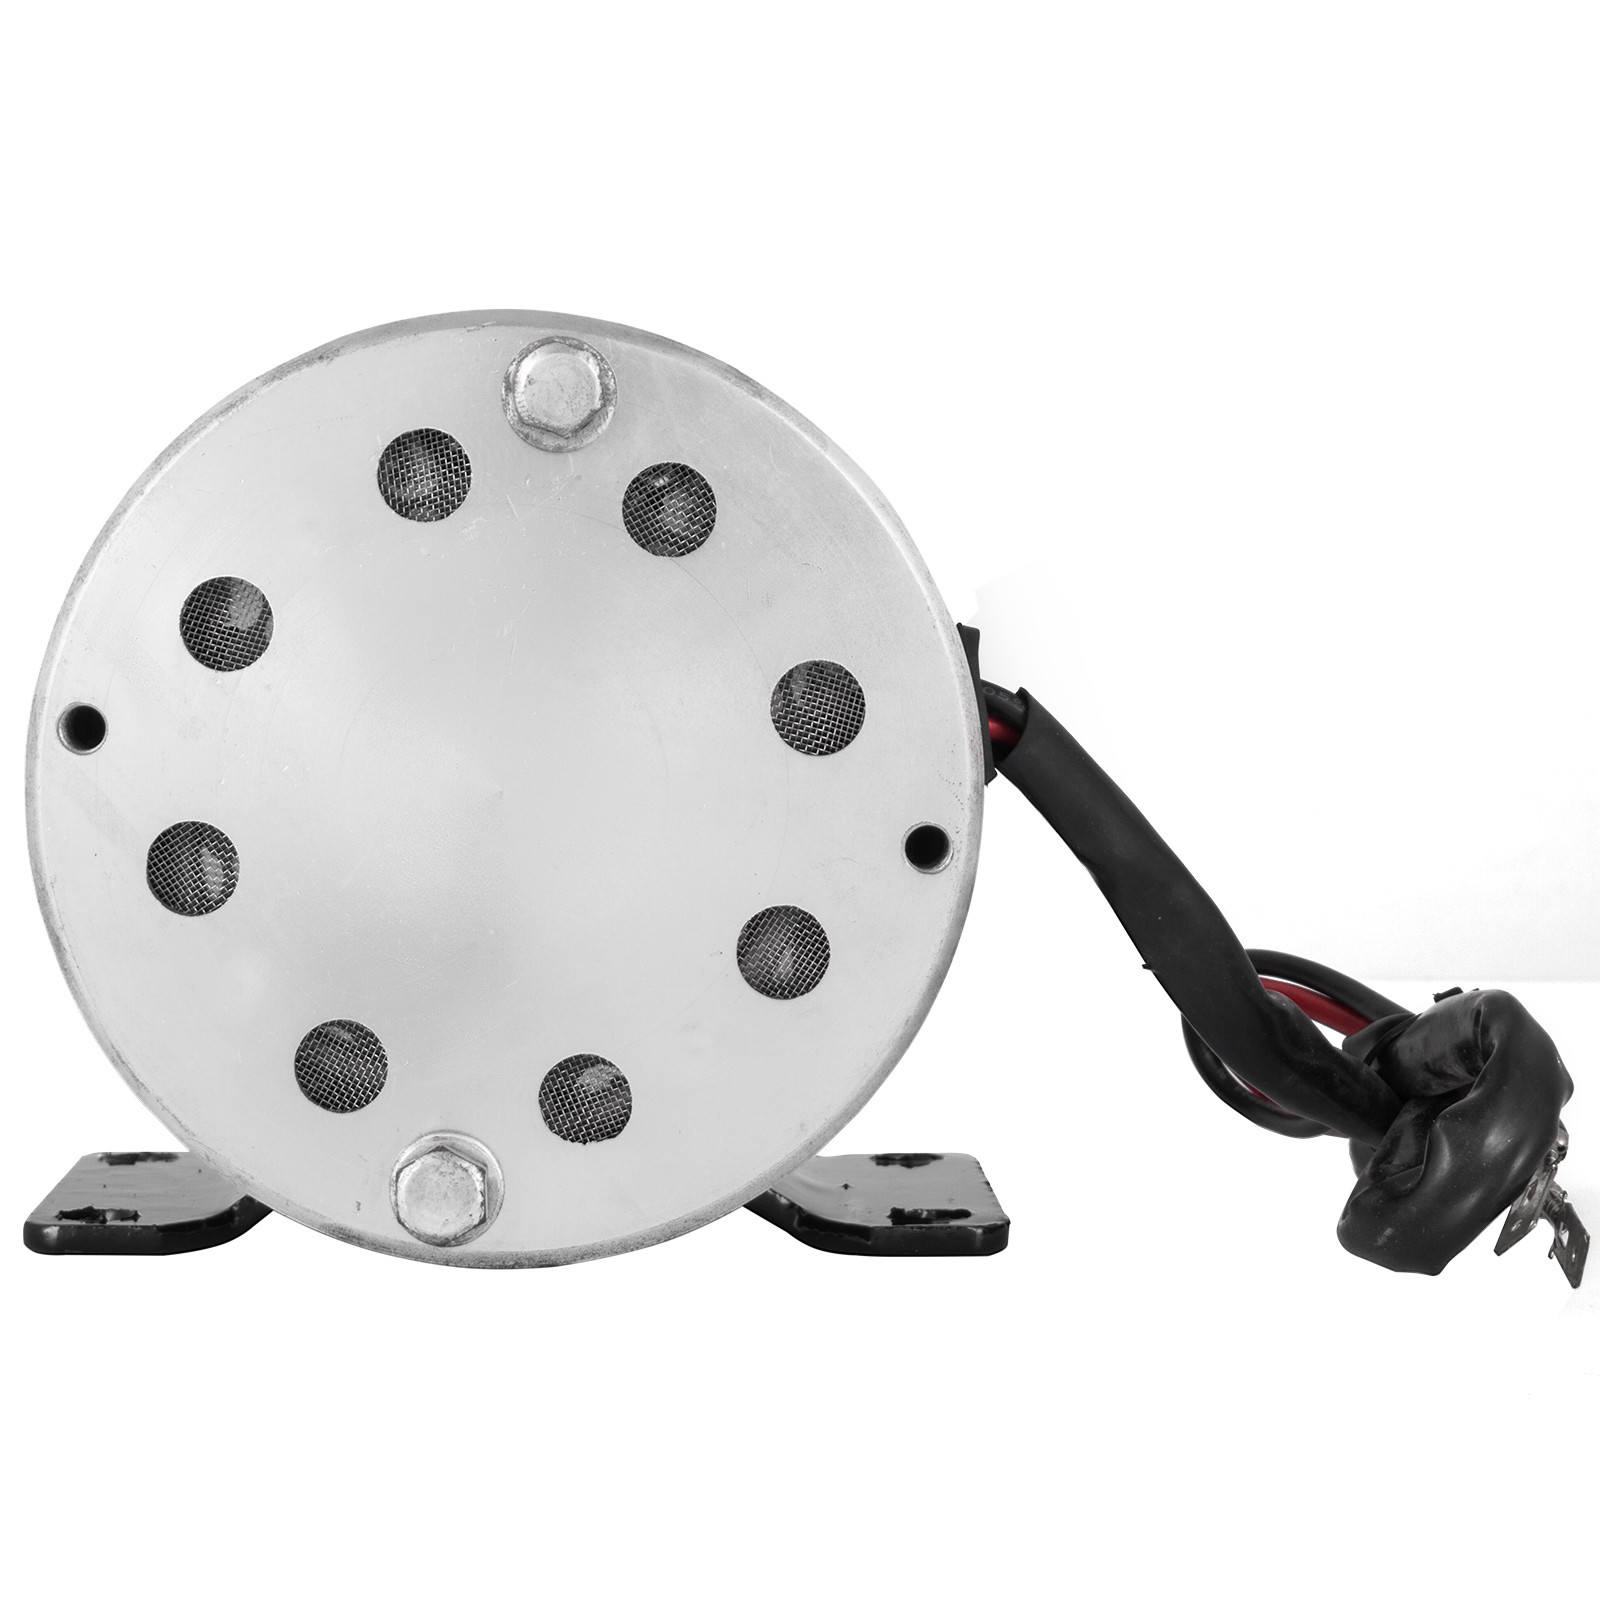 36v-Electric-Motor-controller-throttle-kit-f-Scooter-E-Scooter-ATV-Permanent thumbnail 75